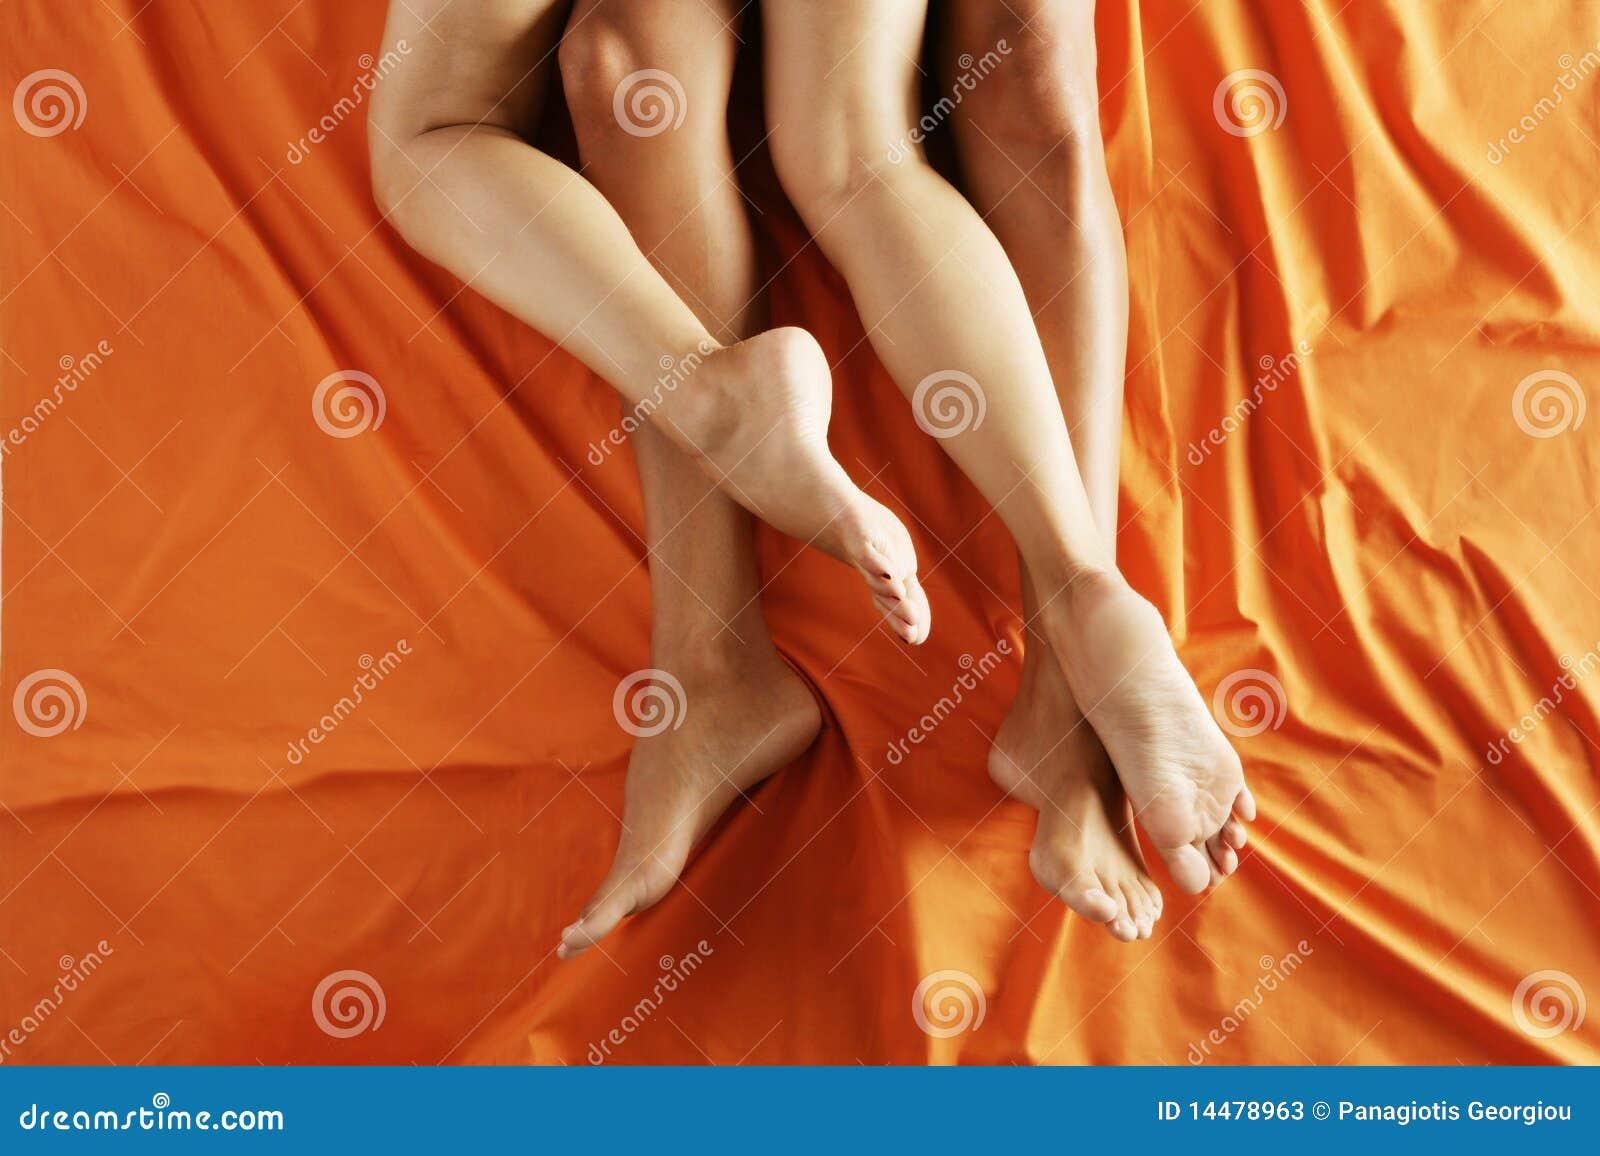 romantica escena de una rubia timida